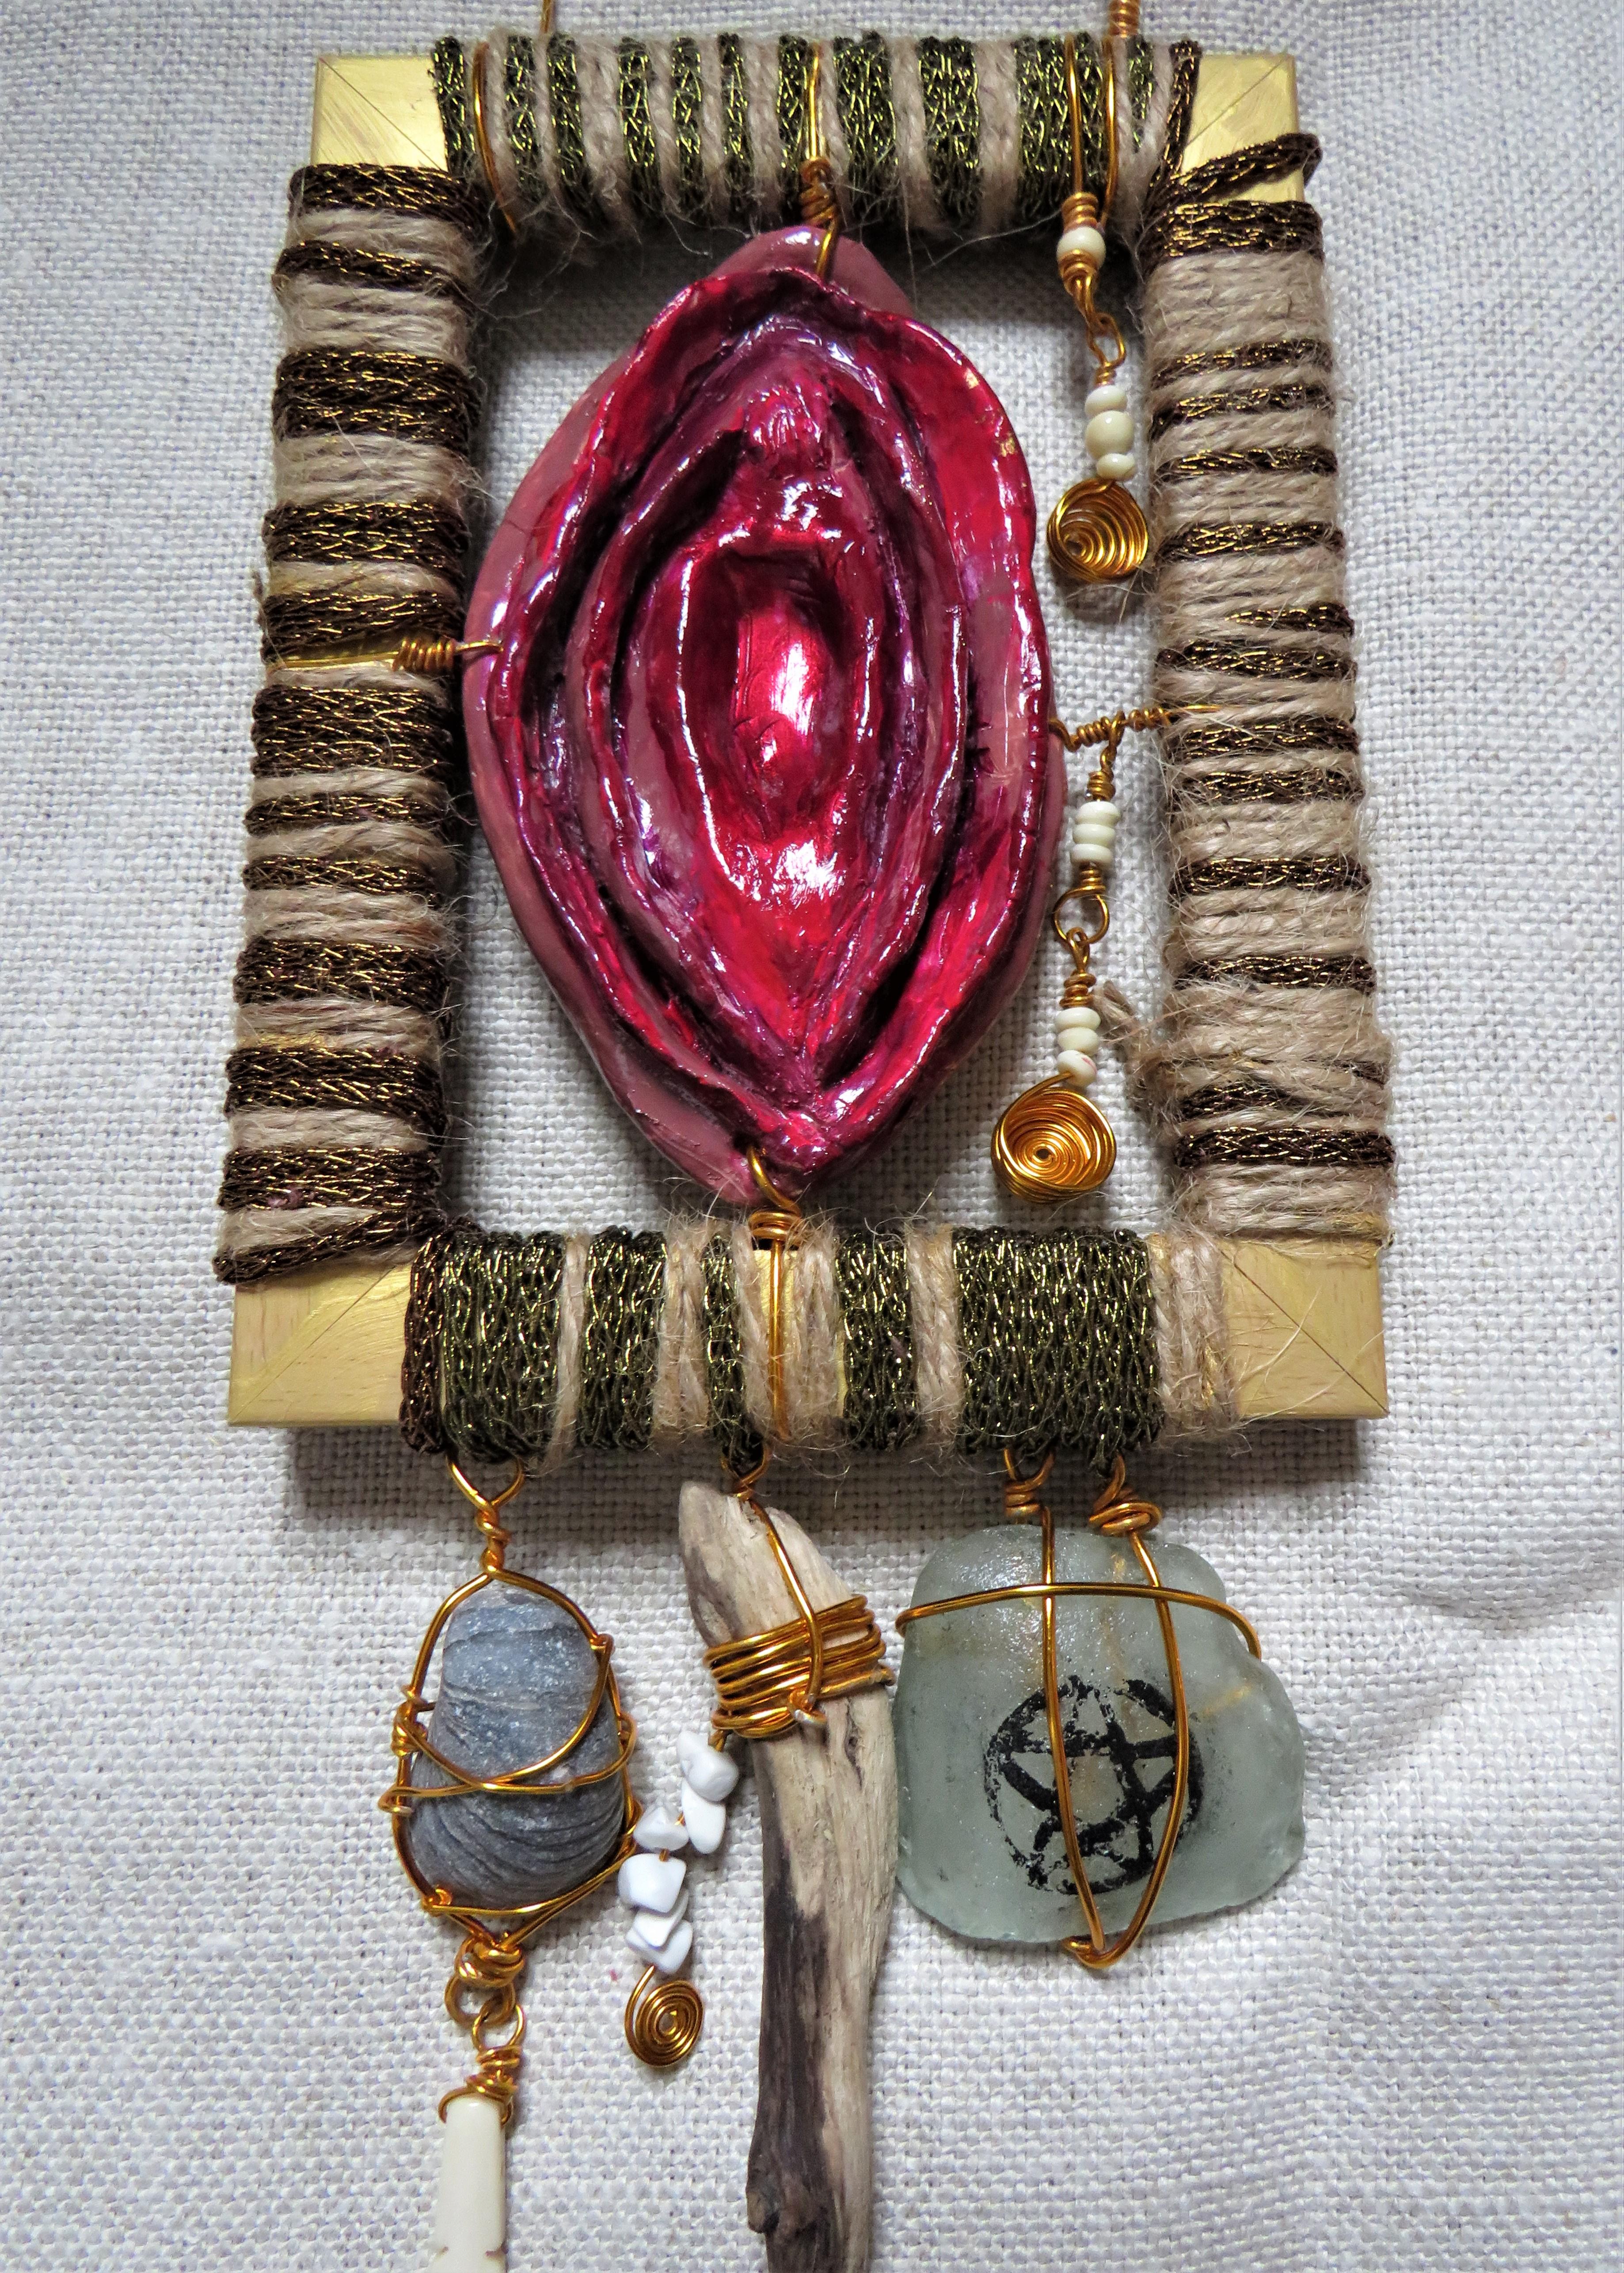 mixed media goddess worship artefact feminist art activism